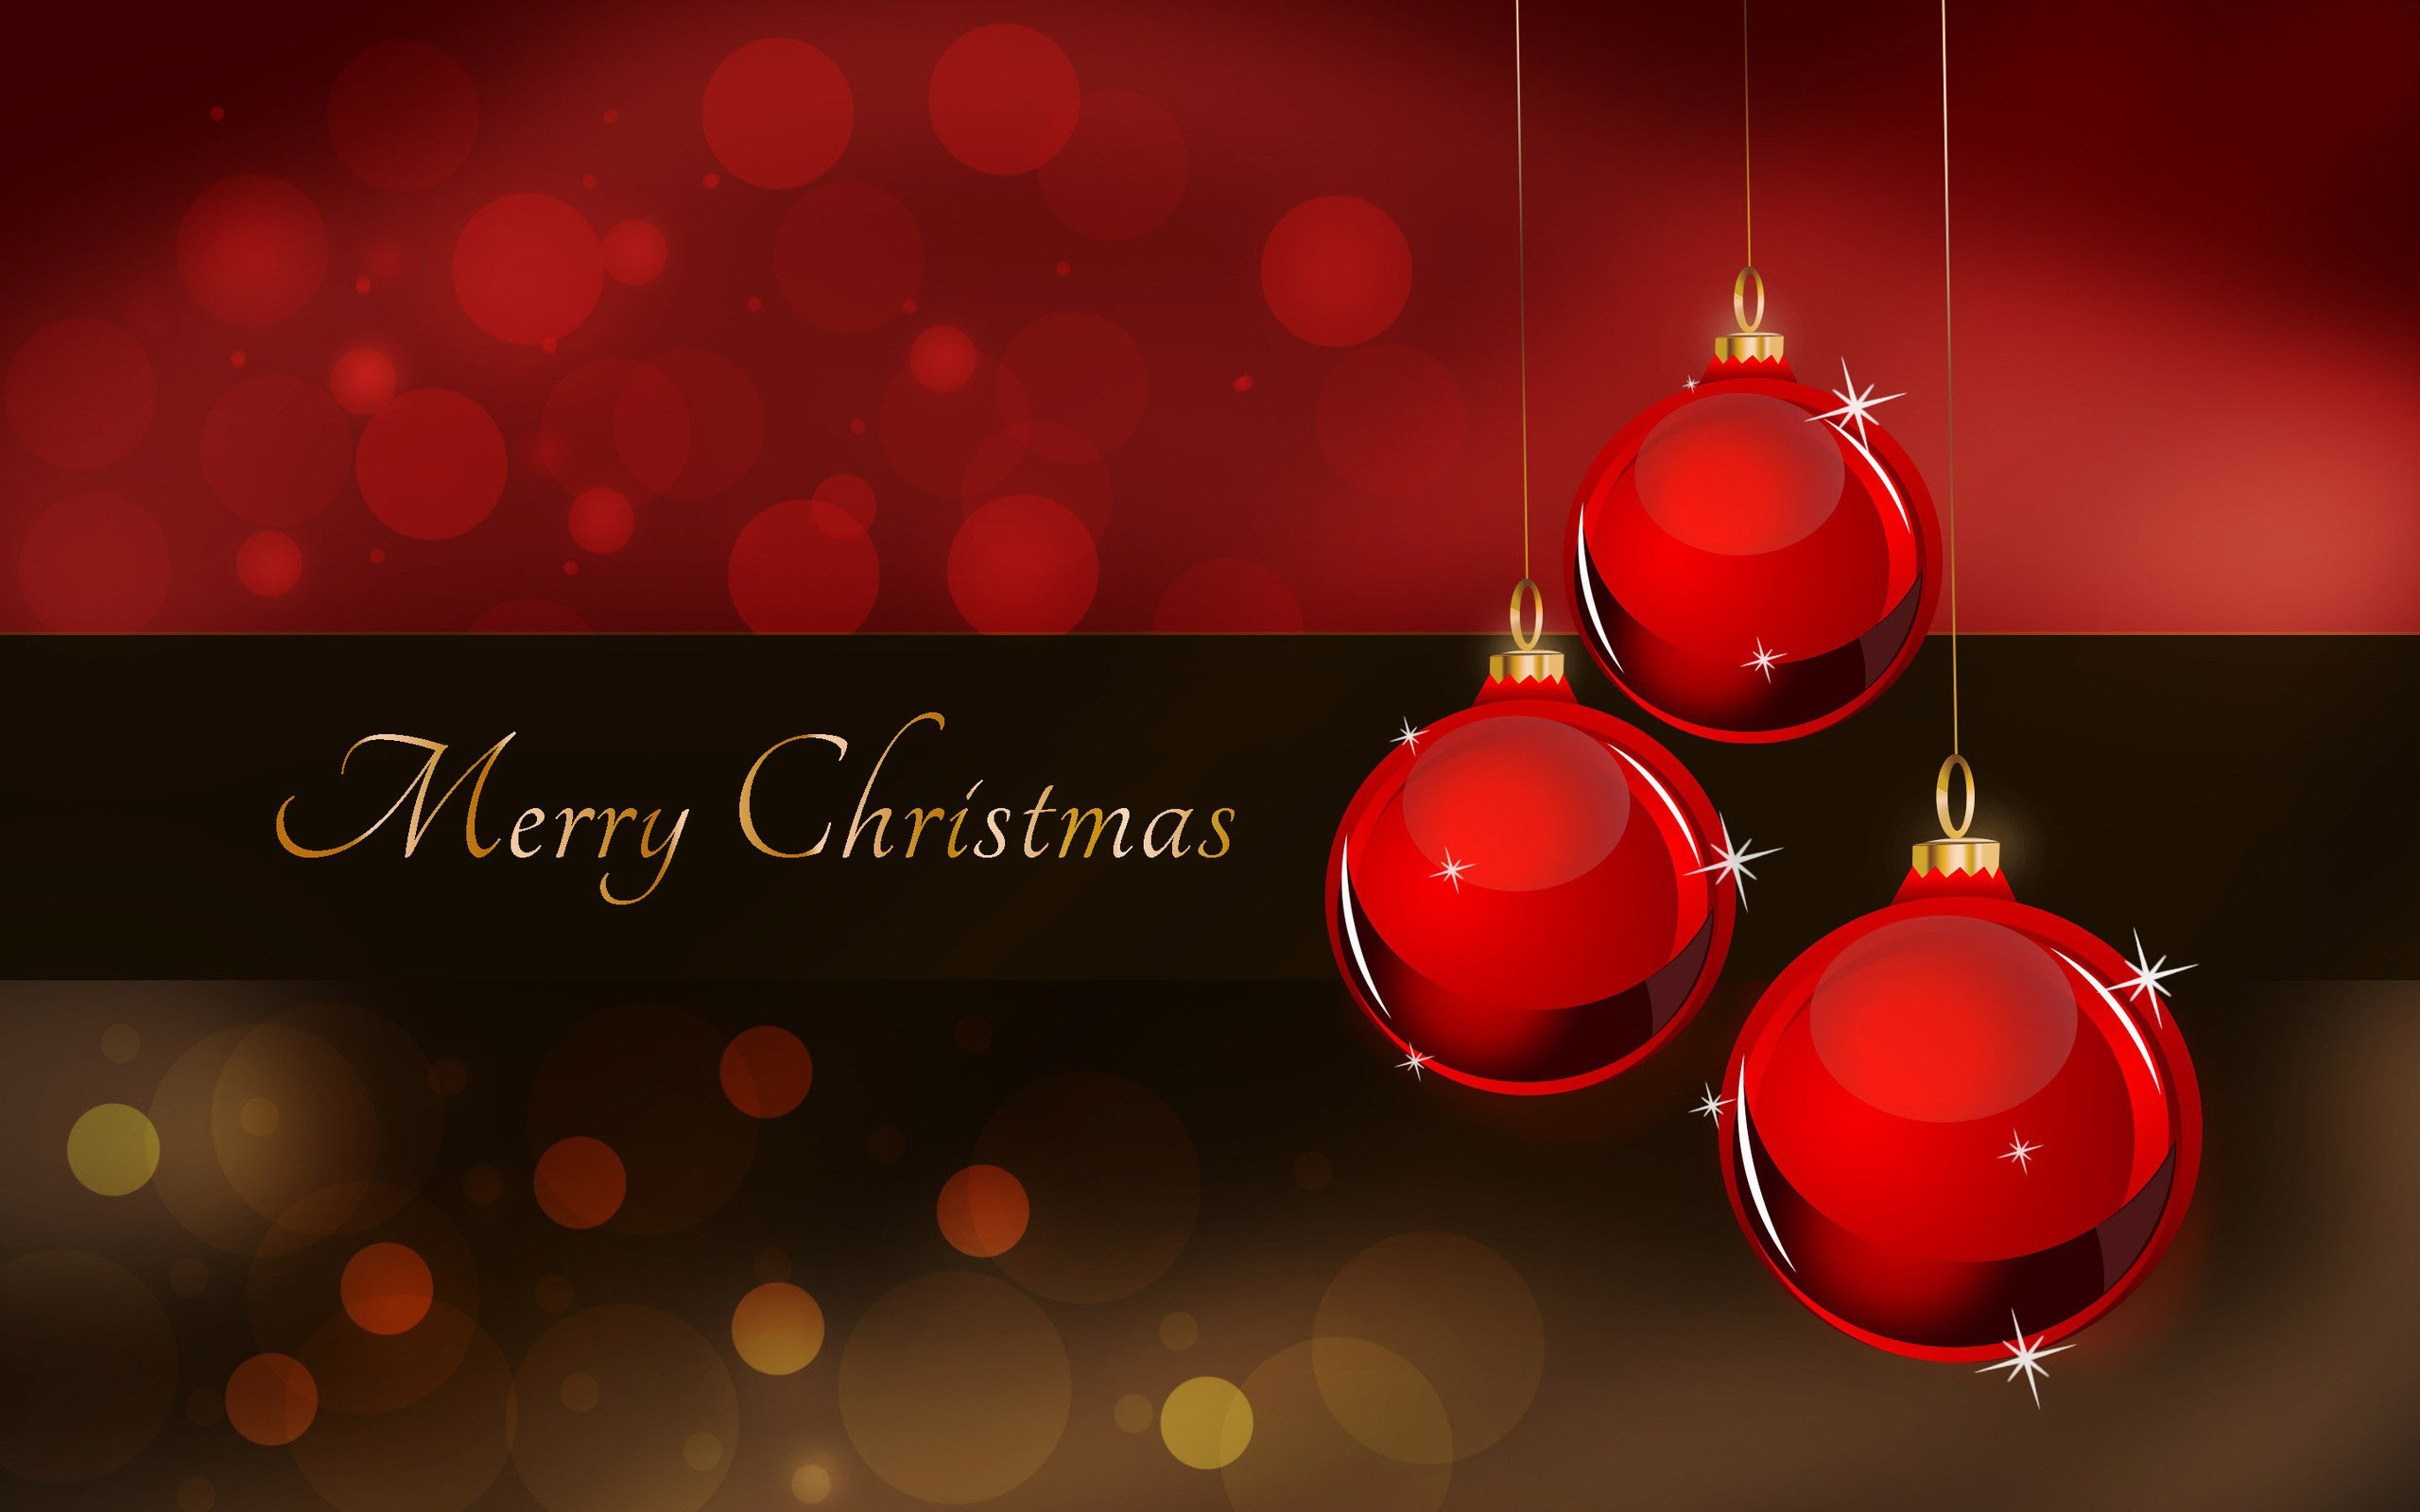 25 Merry Christmas 2014